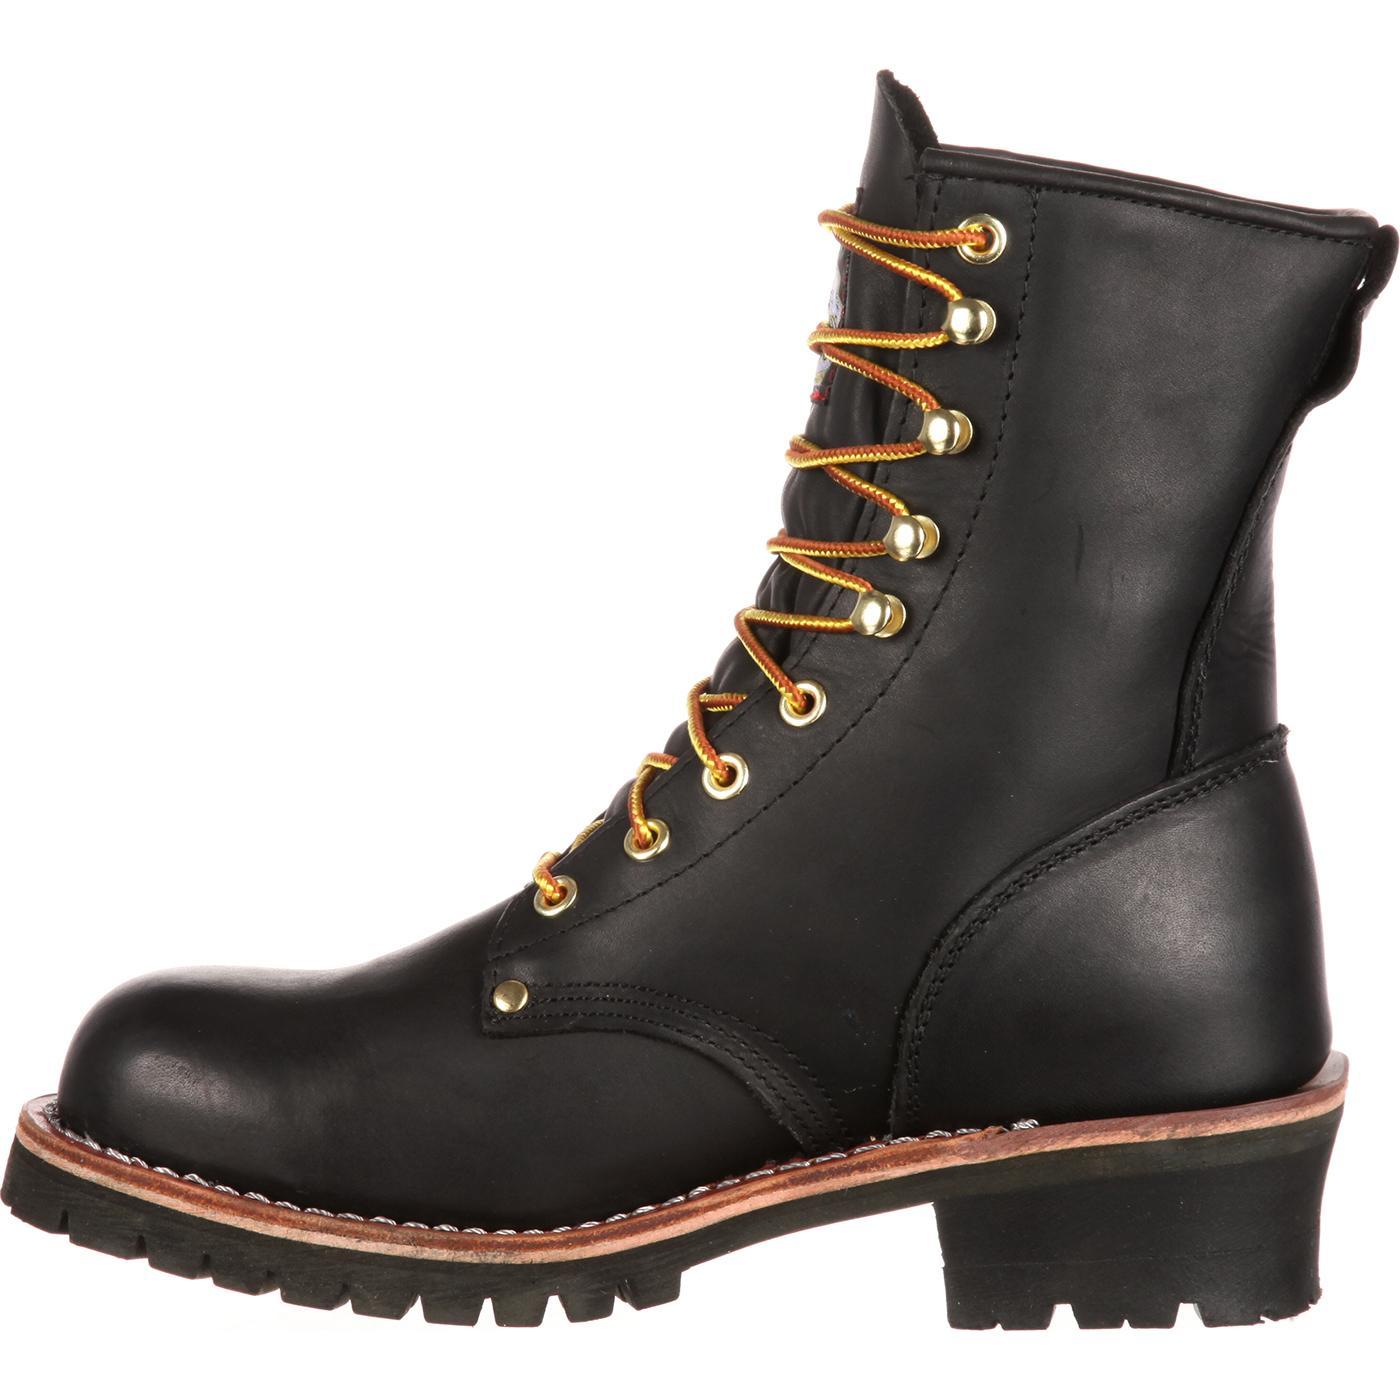 35d92cee7d1 Georgia Boot Logger Work Boot